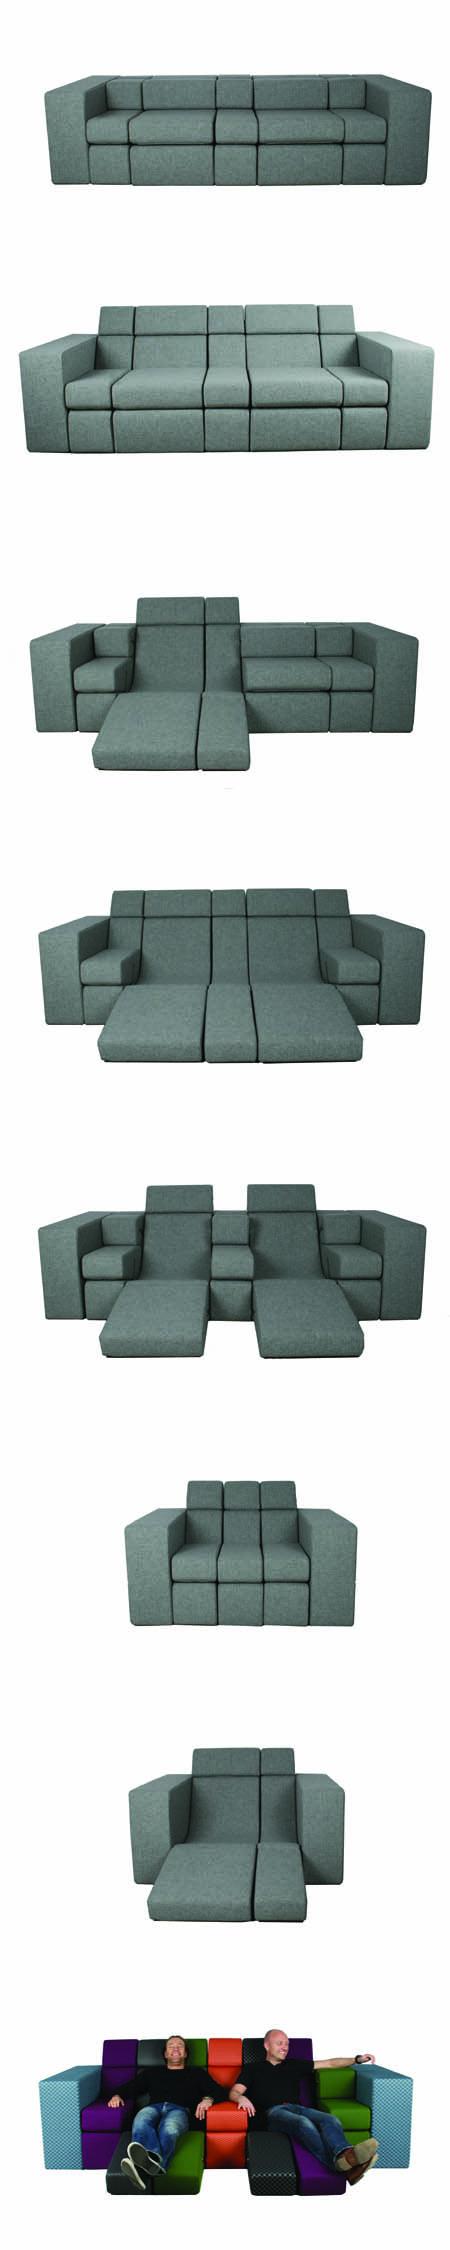 Zona Tortona, divano Bobo design di Michael Kruijne